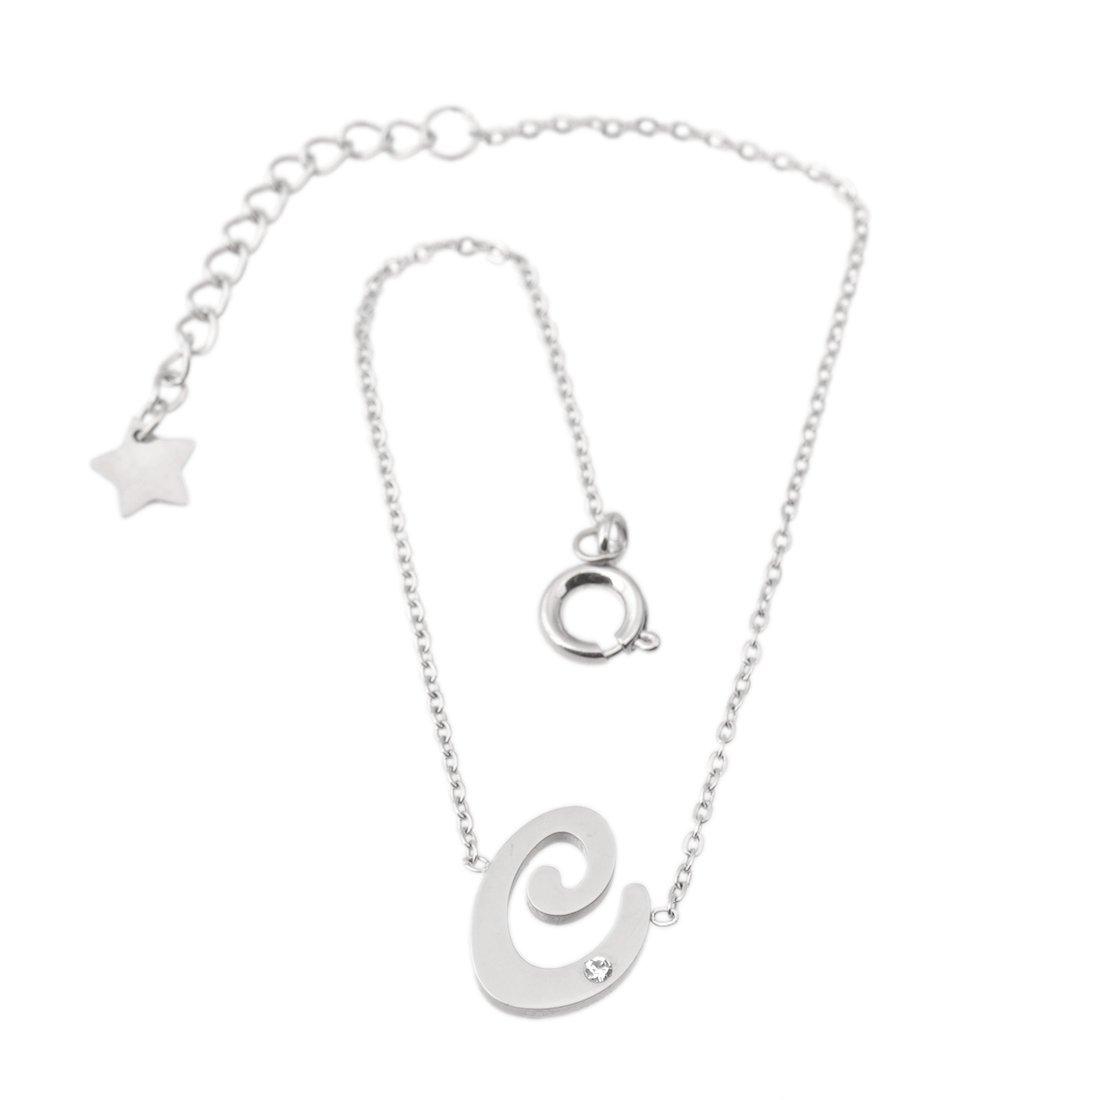 JOINONE Script Letter Rhinestone Charm Bracelet A to Z Friendship Gifts Jewelrys for Womens Girls